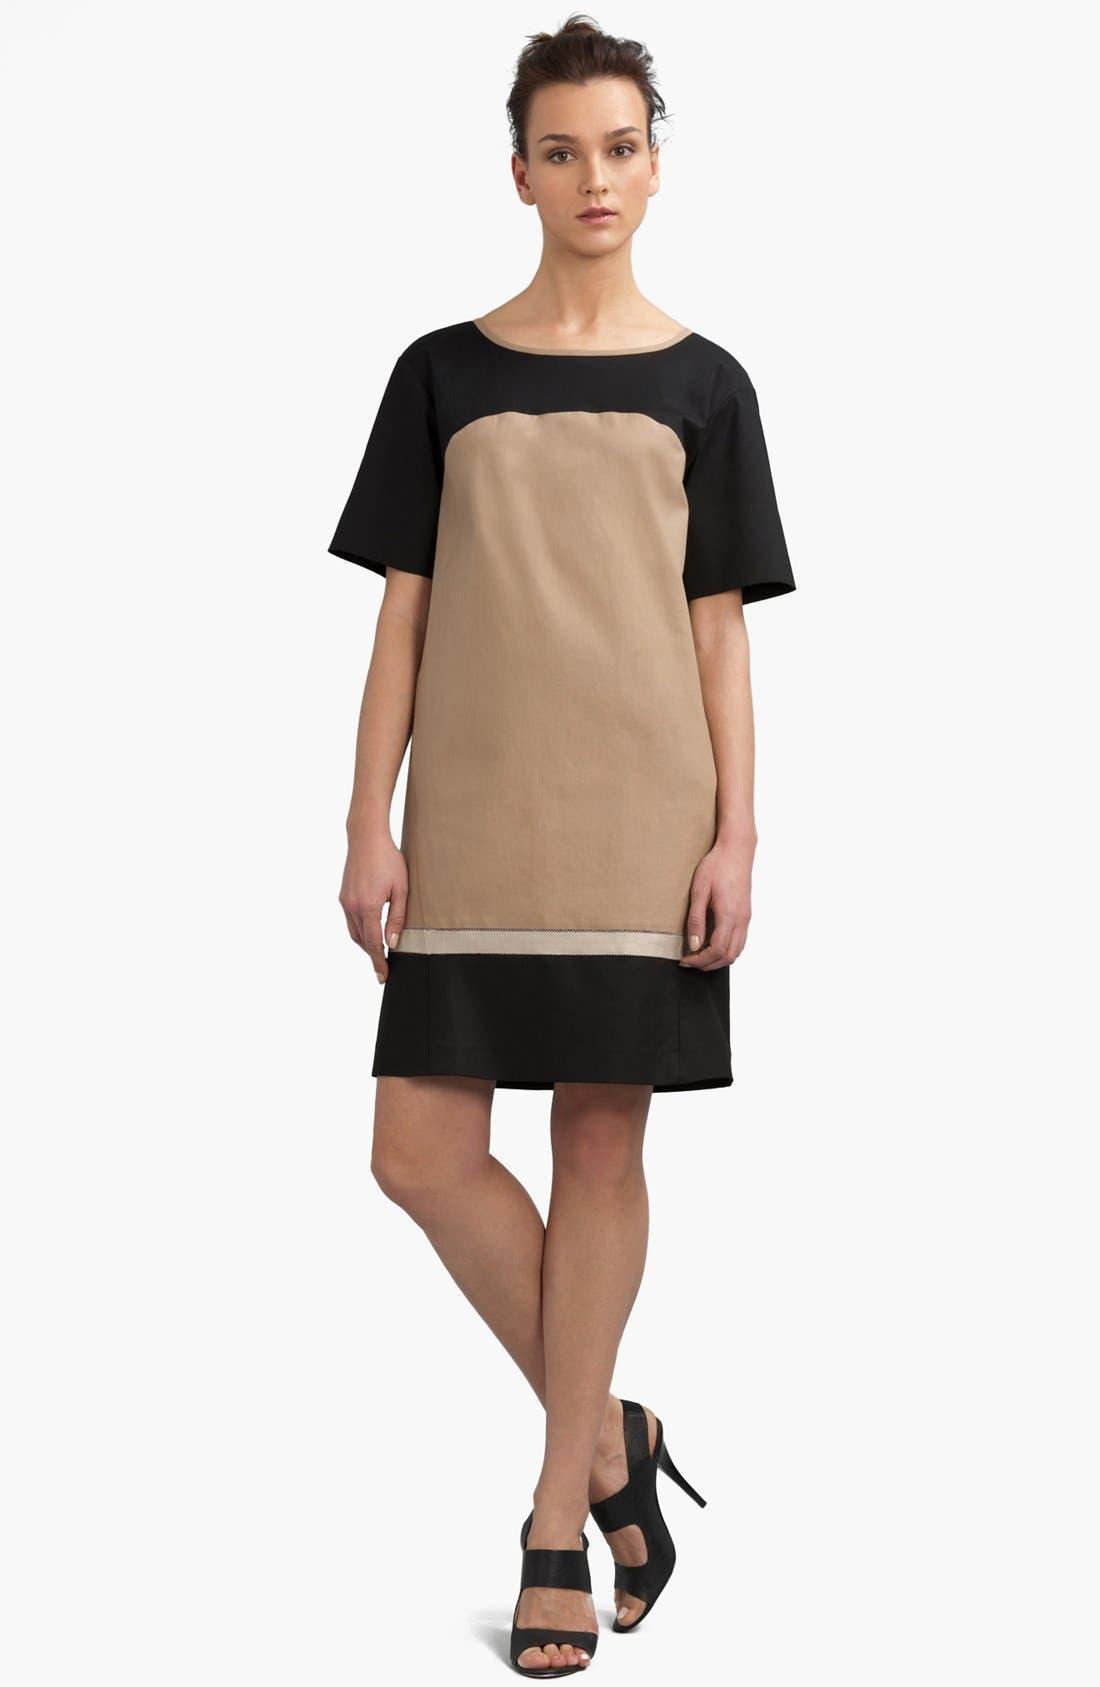 Alternate Image 1 Selected - Lafayette 148 New York 'Evita' Colorblock Shift Dress